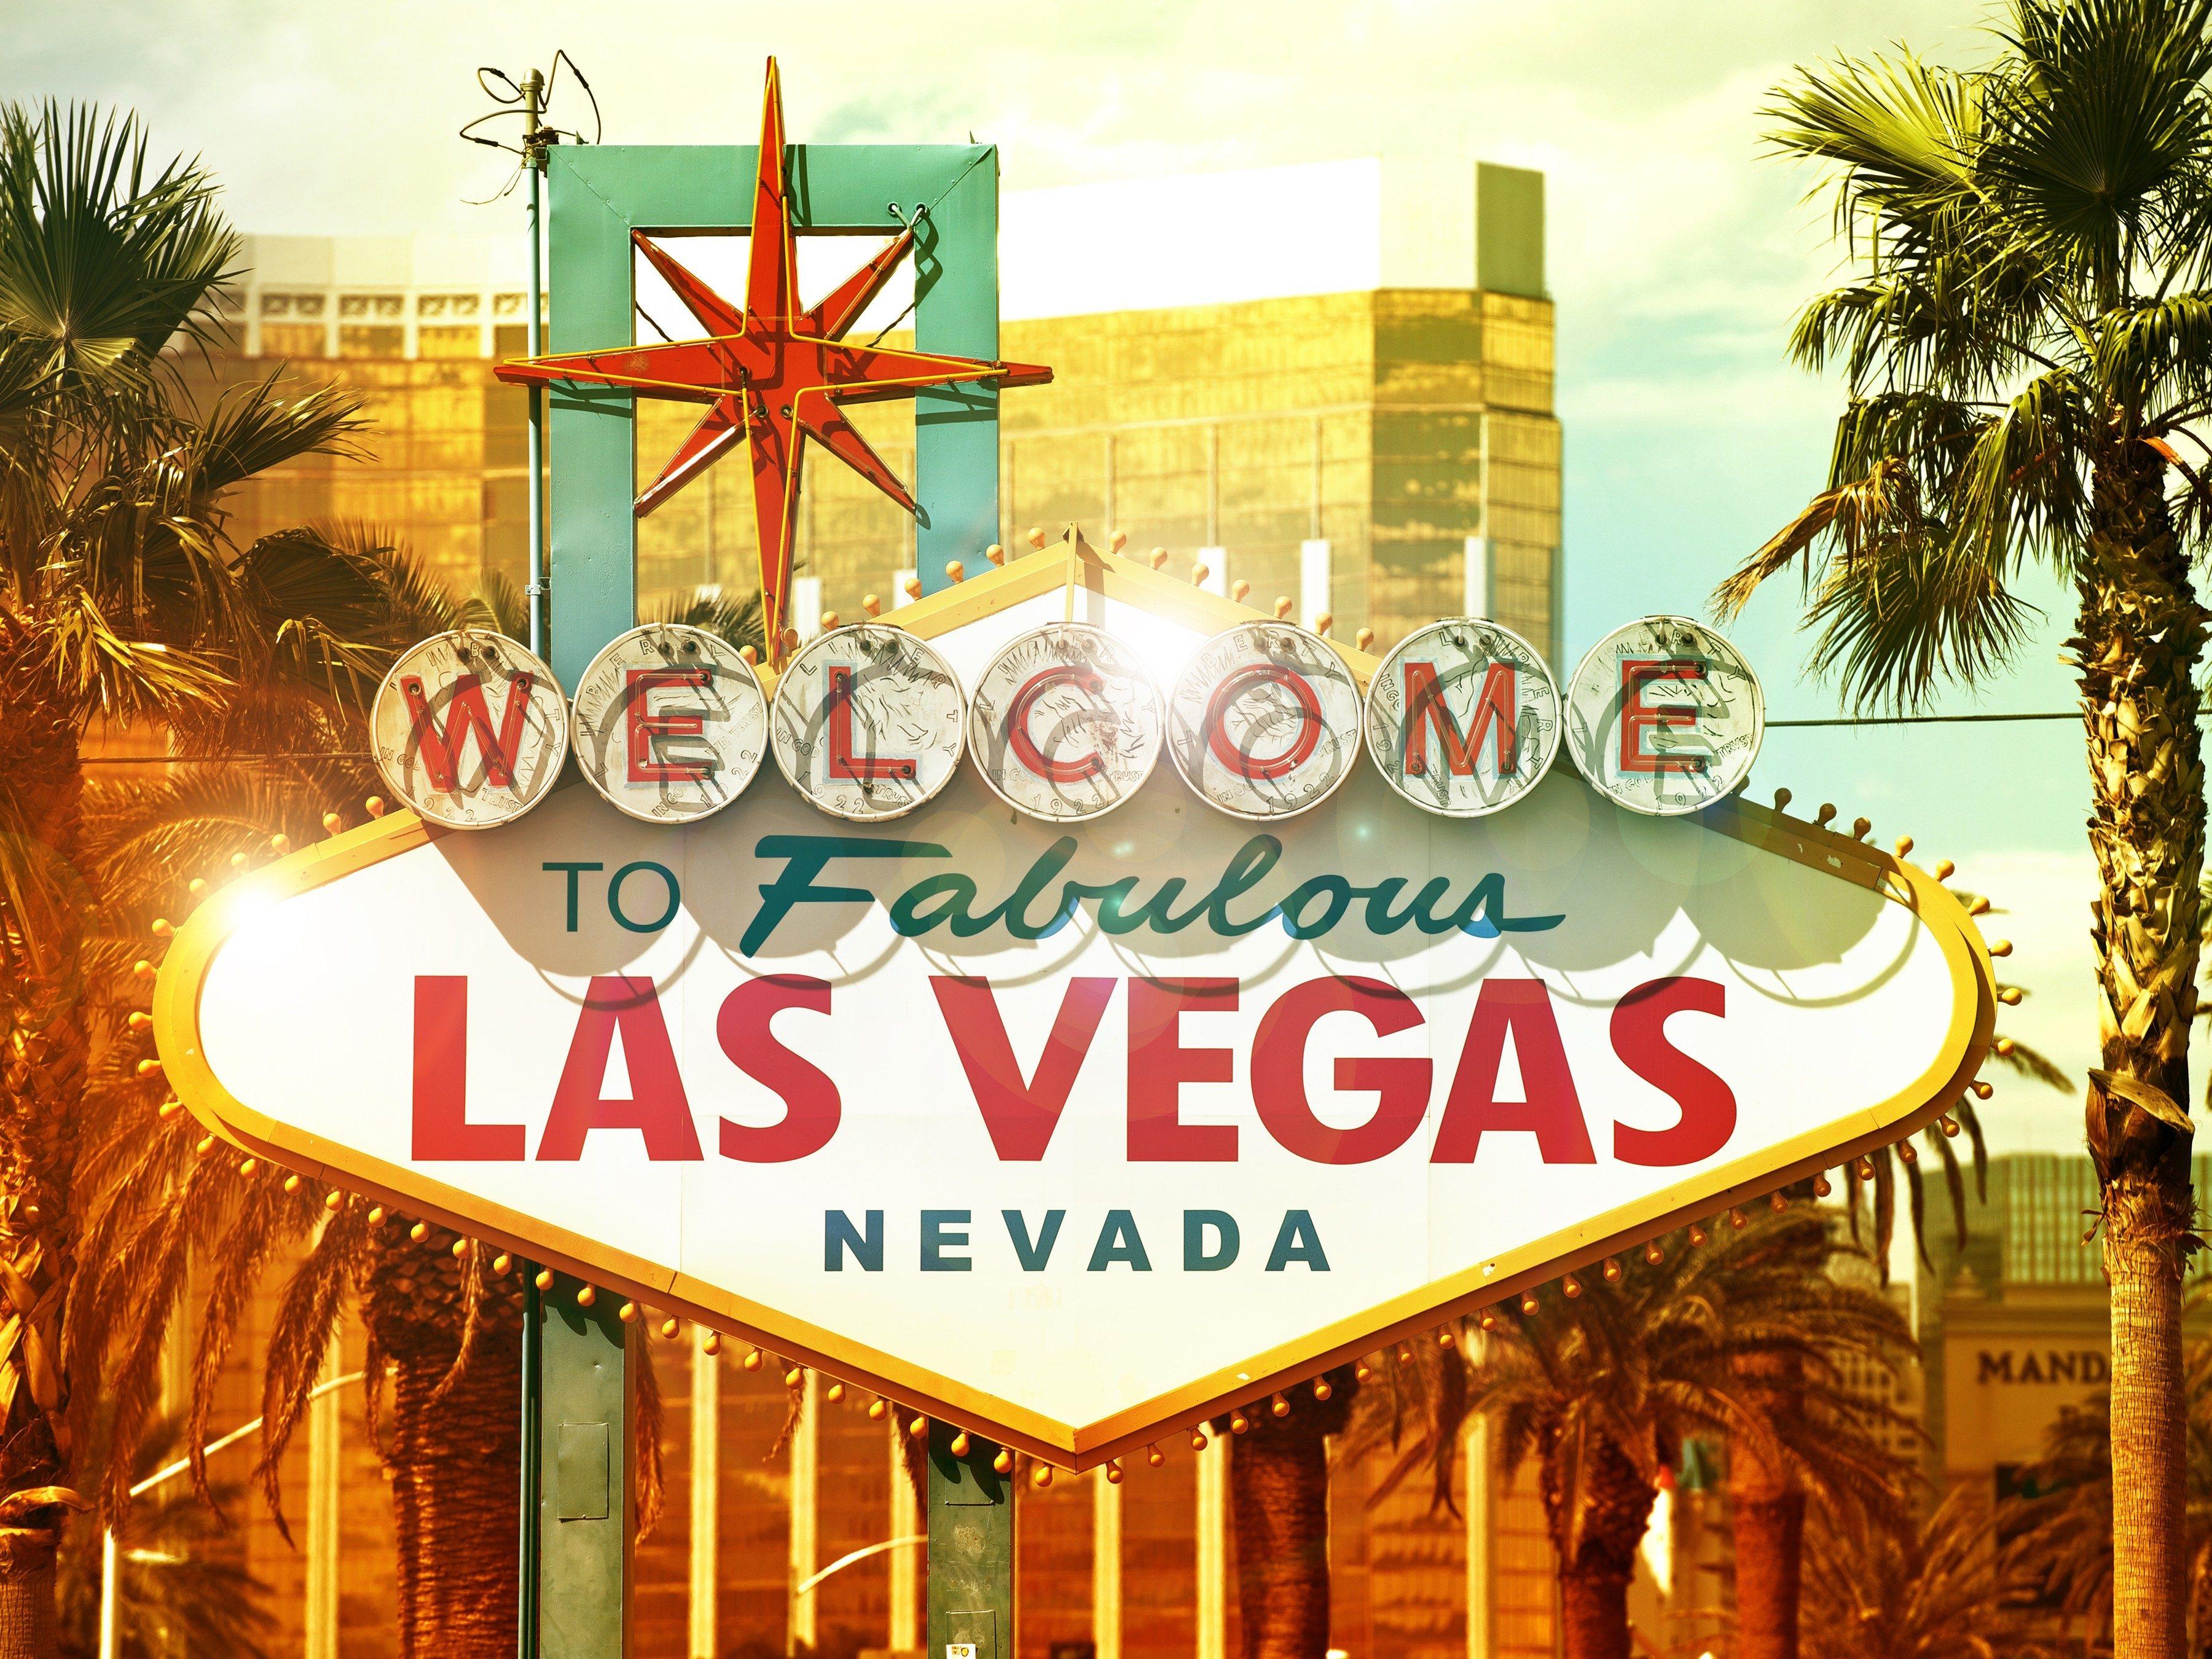 10 Amazing Reasons to Visit Las Vegas: The Strip